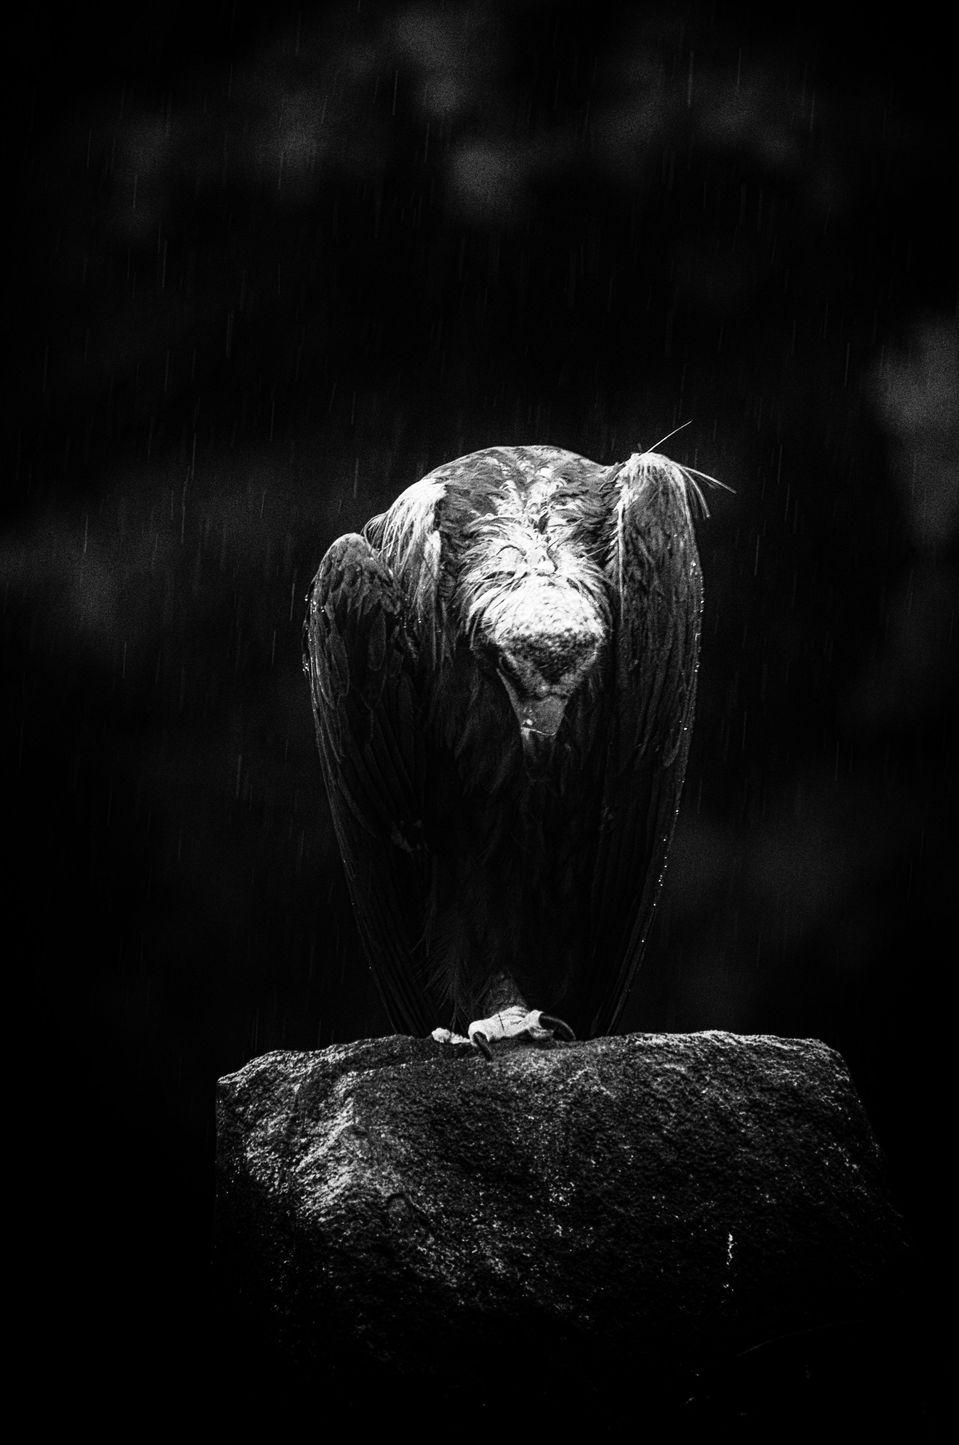 Black & white eagle